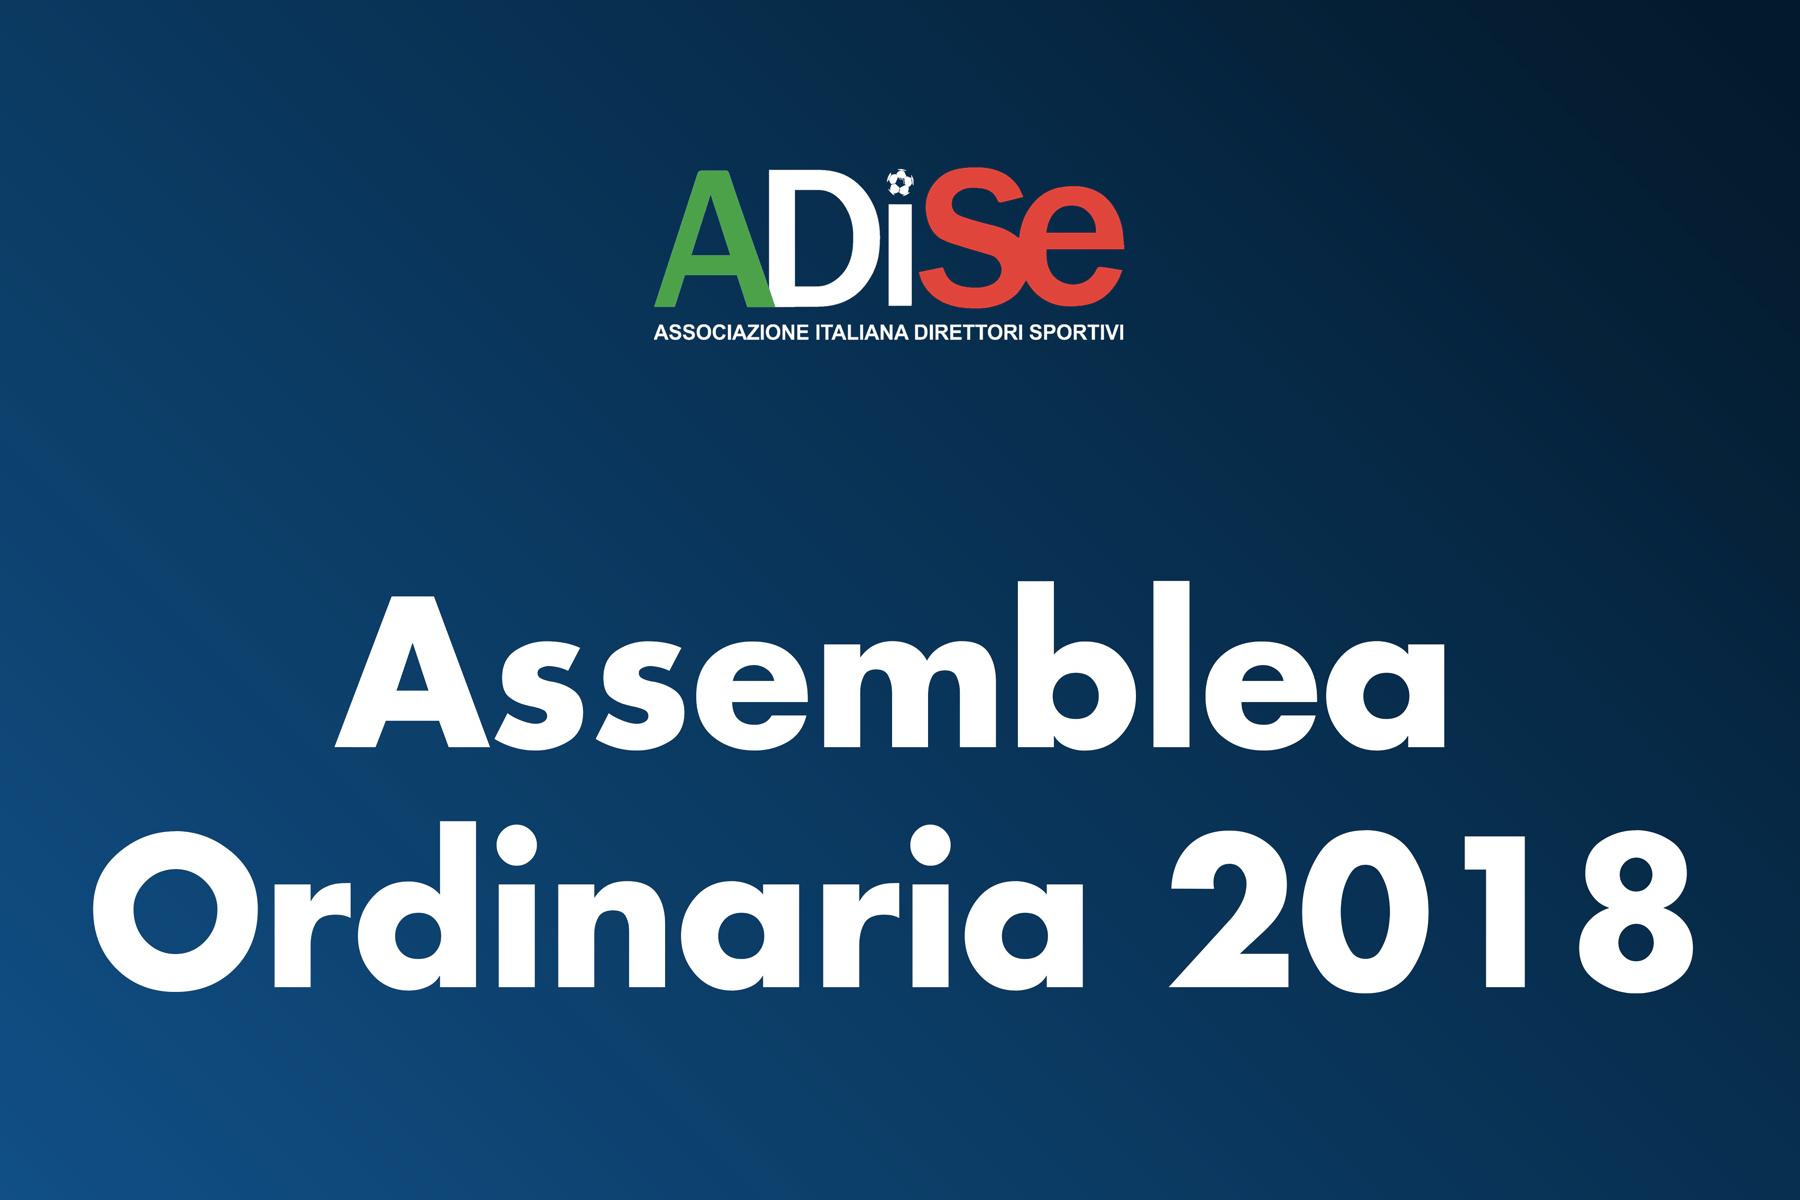 IL 26 NOVEMBRE 2018 A MILANO L'ASSEMBLEA ORDINARIA